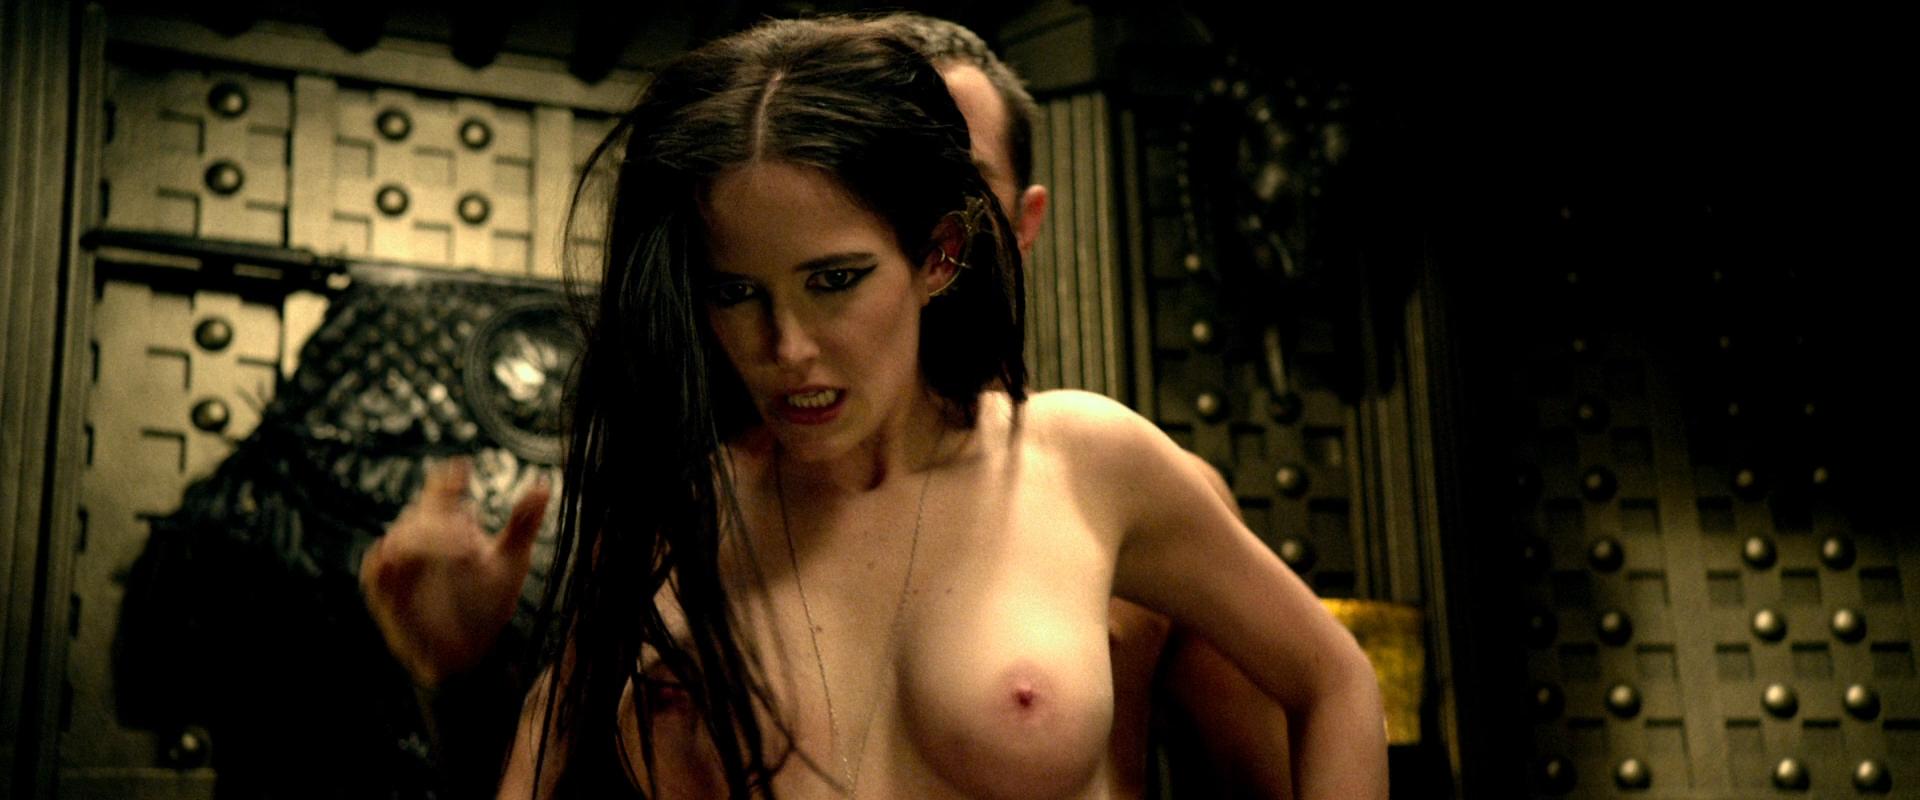 Story sexgirls erotic movies